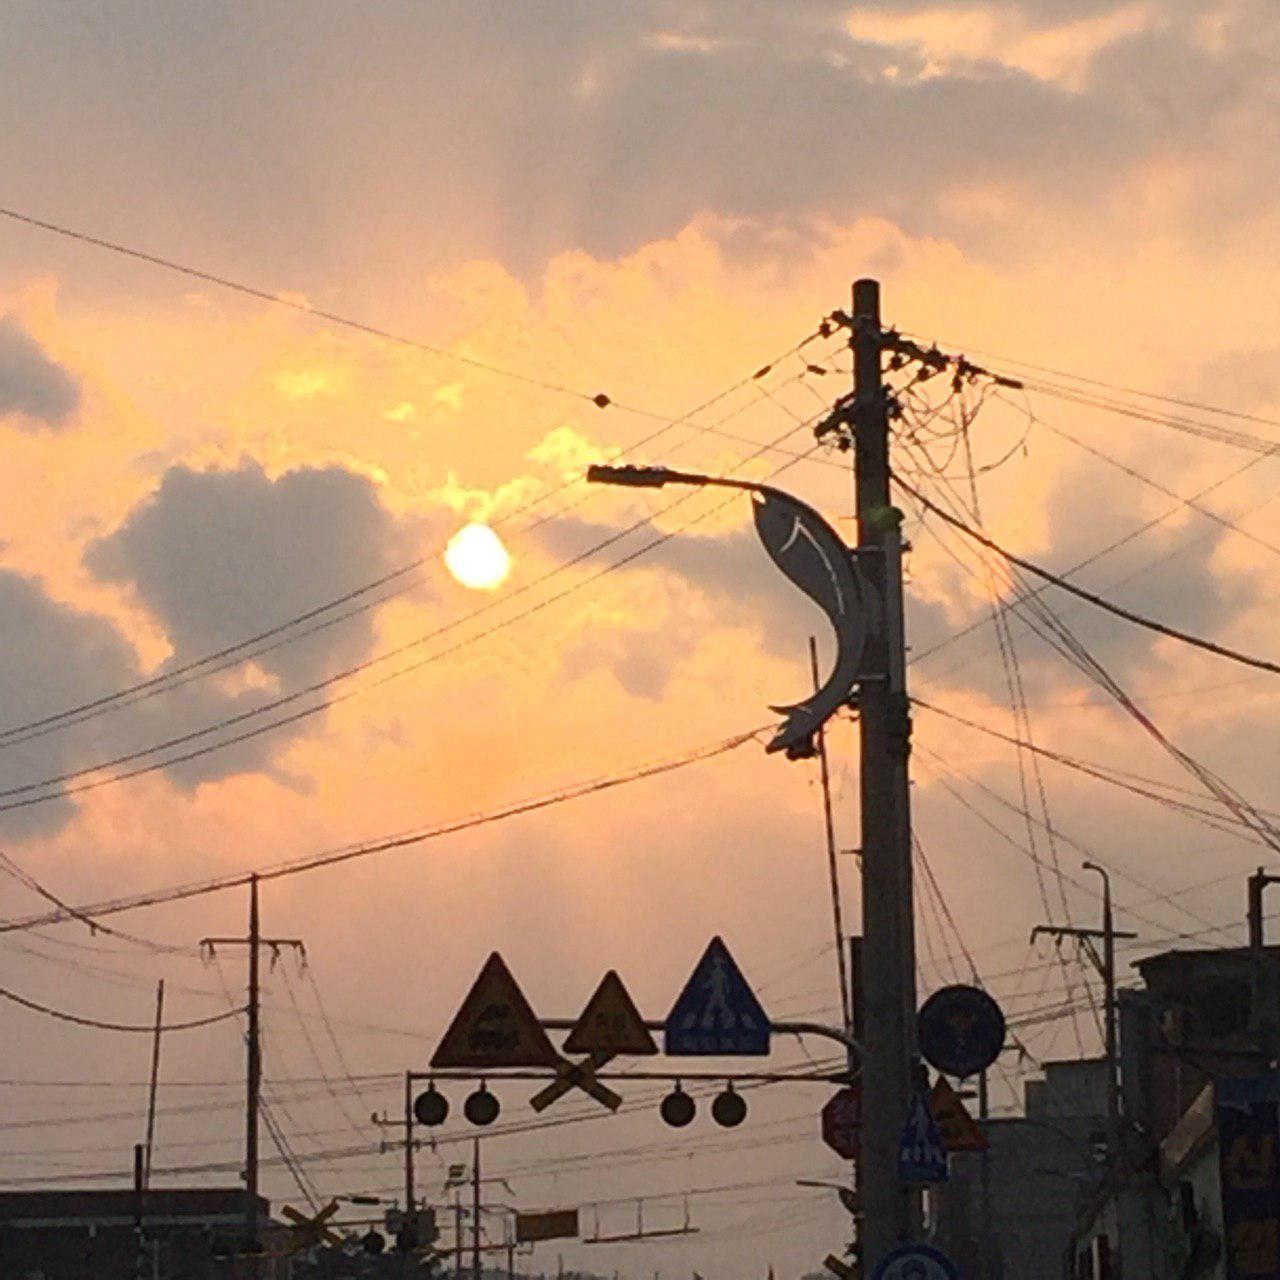 photo_2019-04-01_14-07-10.jpg